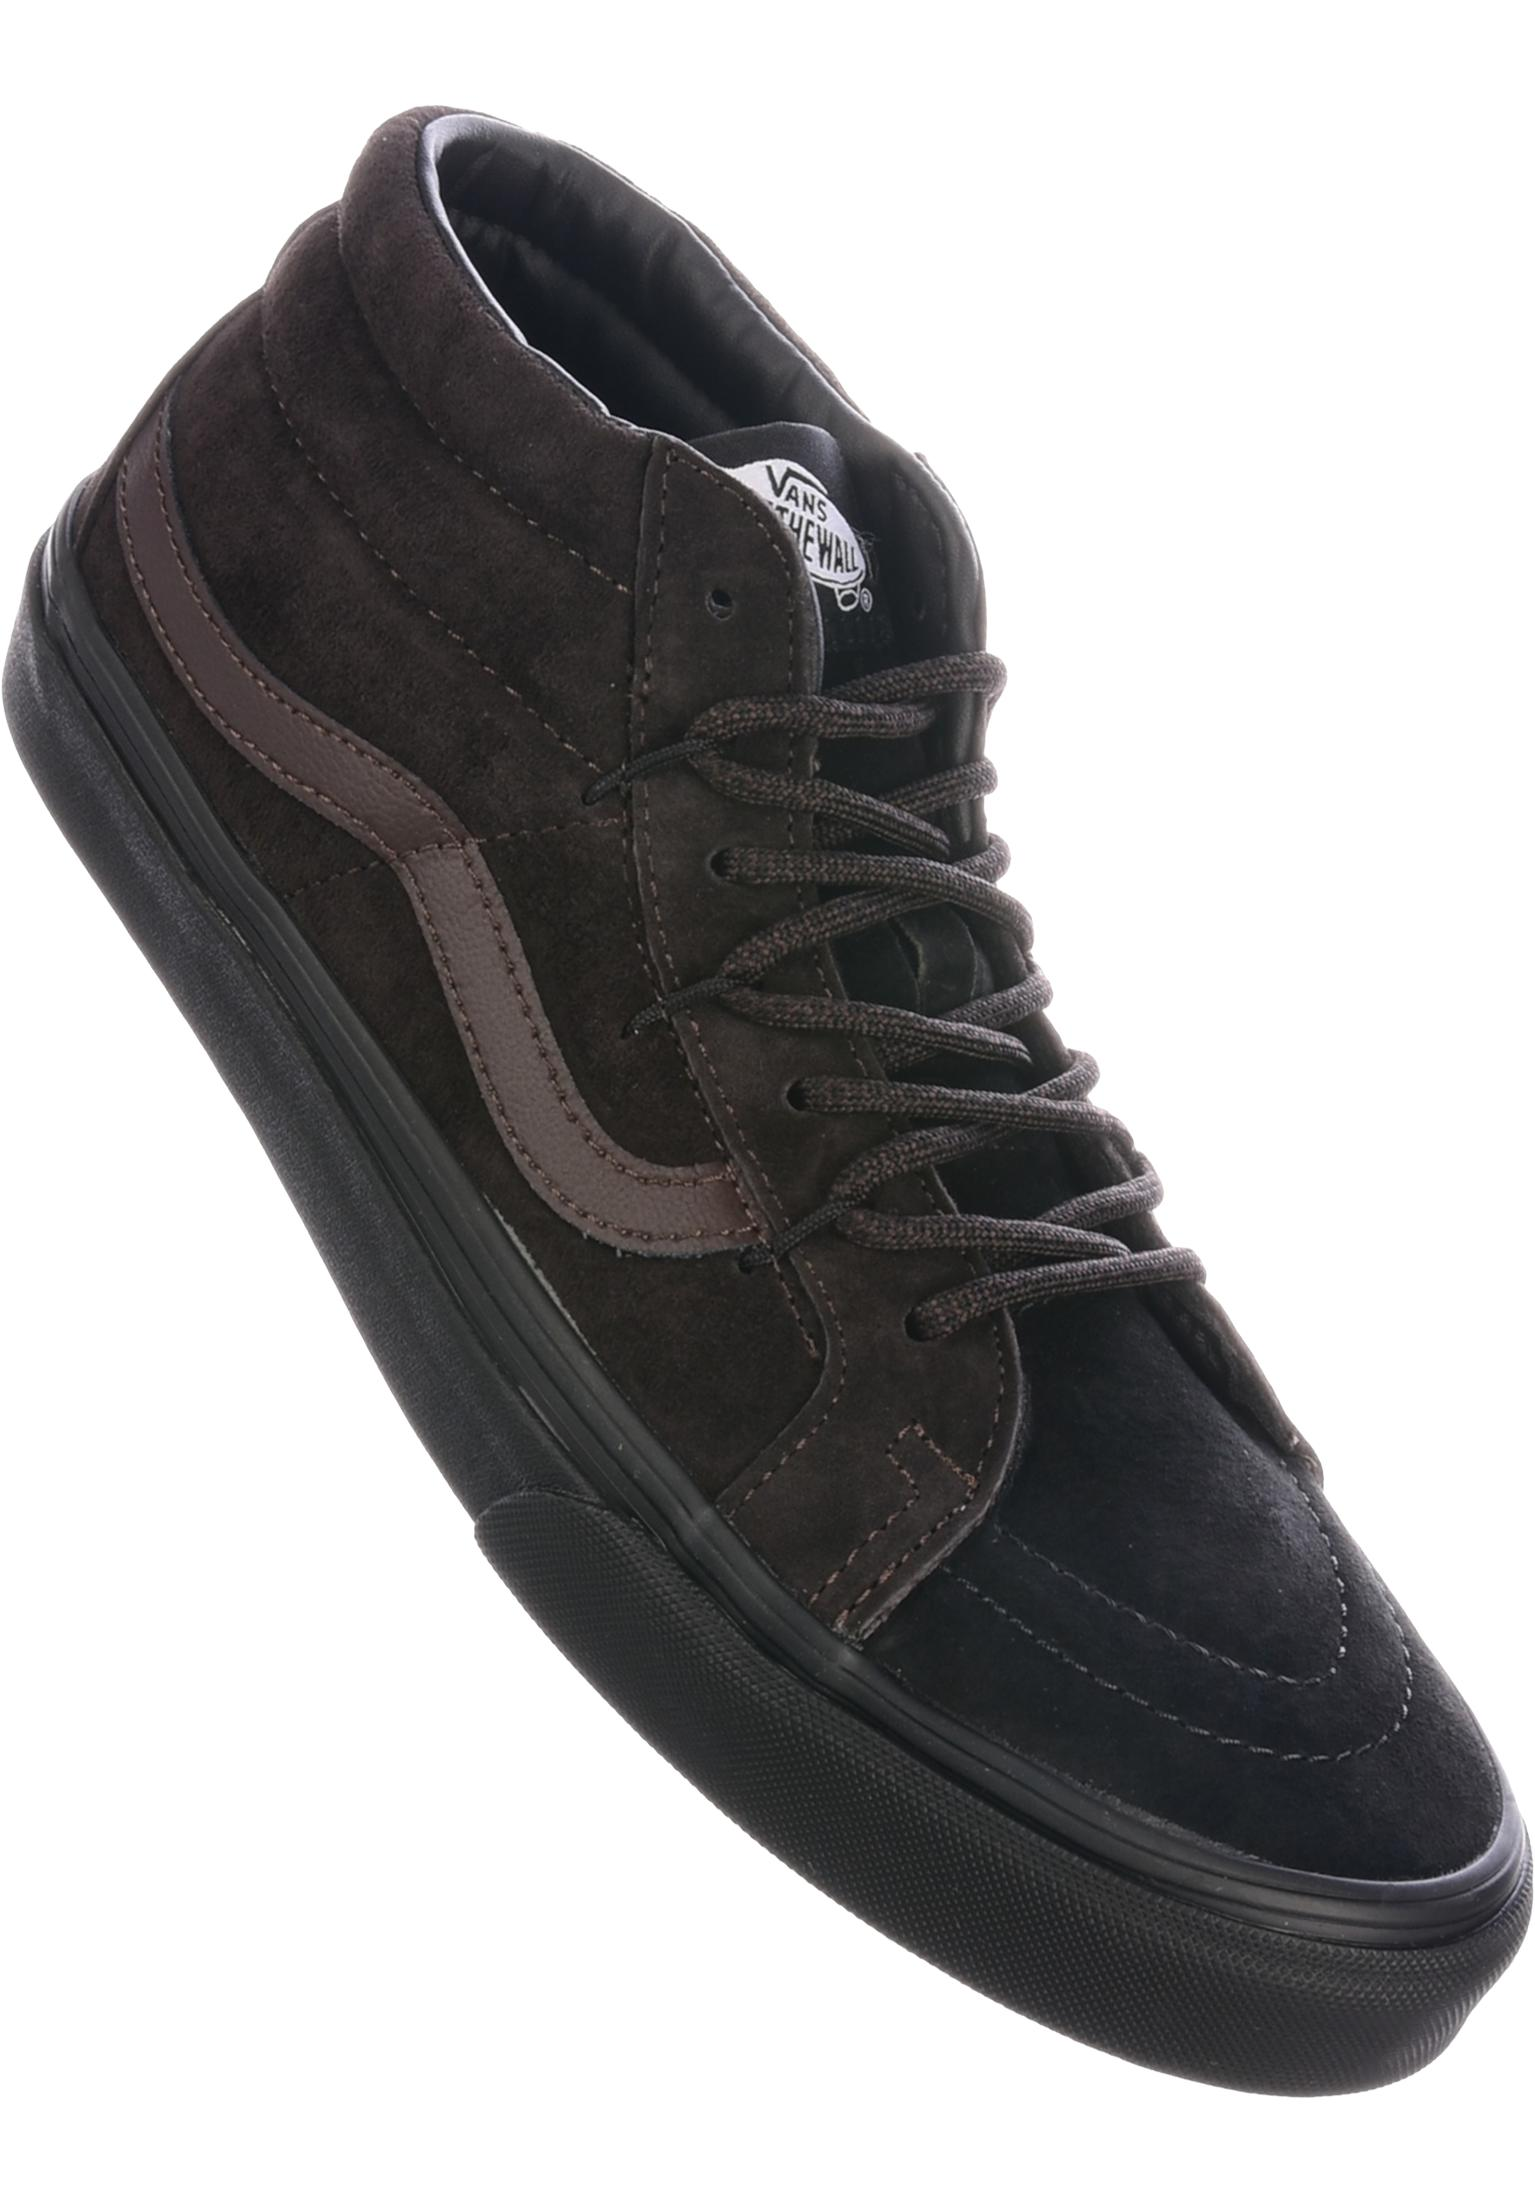 Sneaker   Frauen   Schuhe   Bodycheck